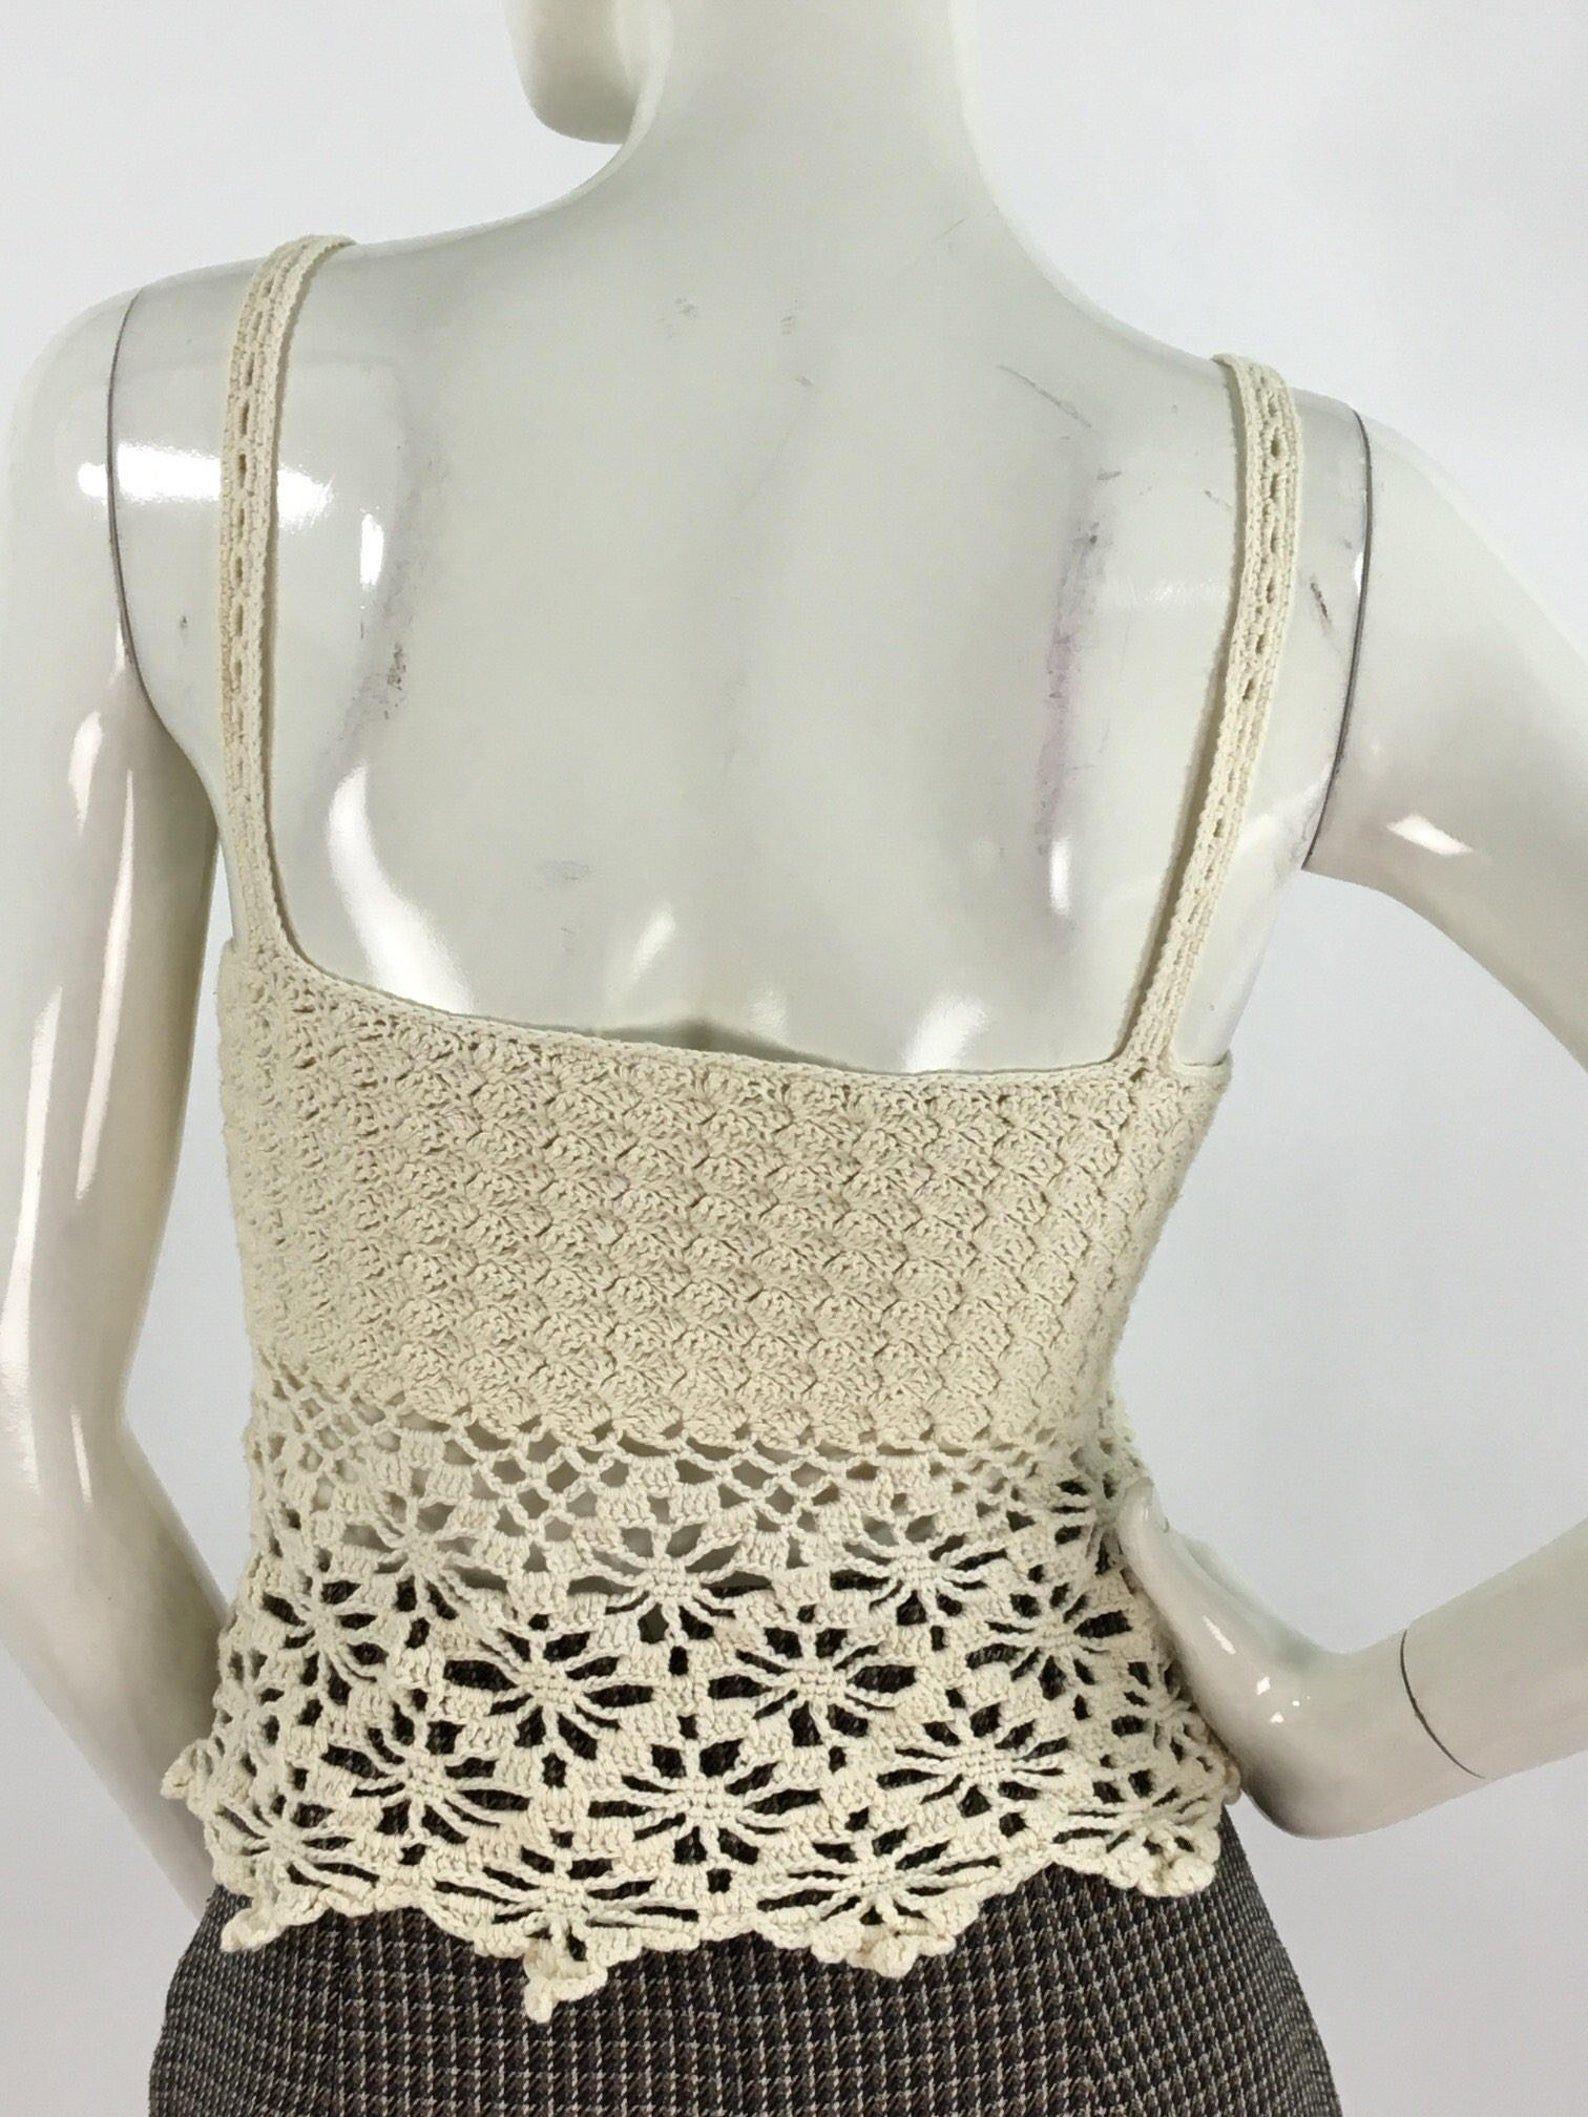 Vintage off white crochet top/crochet tank top/vintage crochet top #crochettanktops